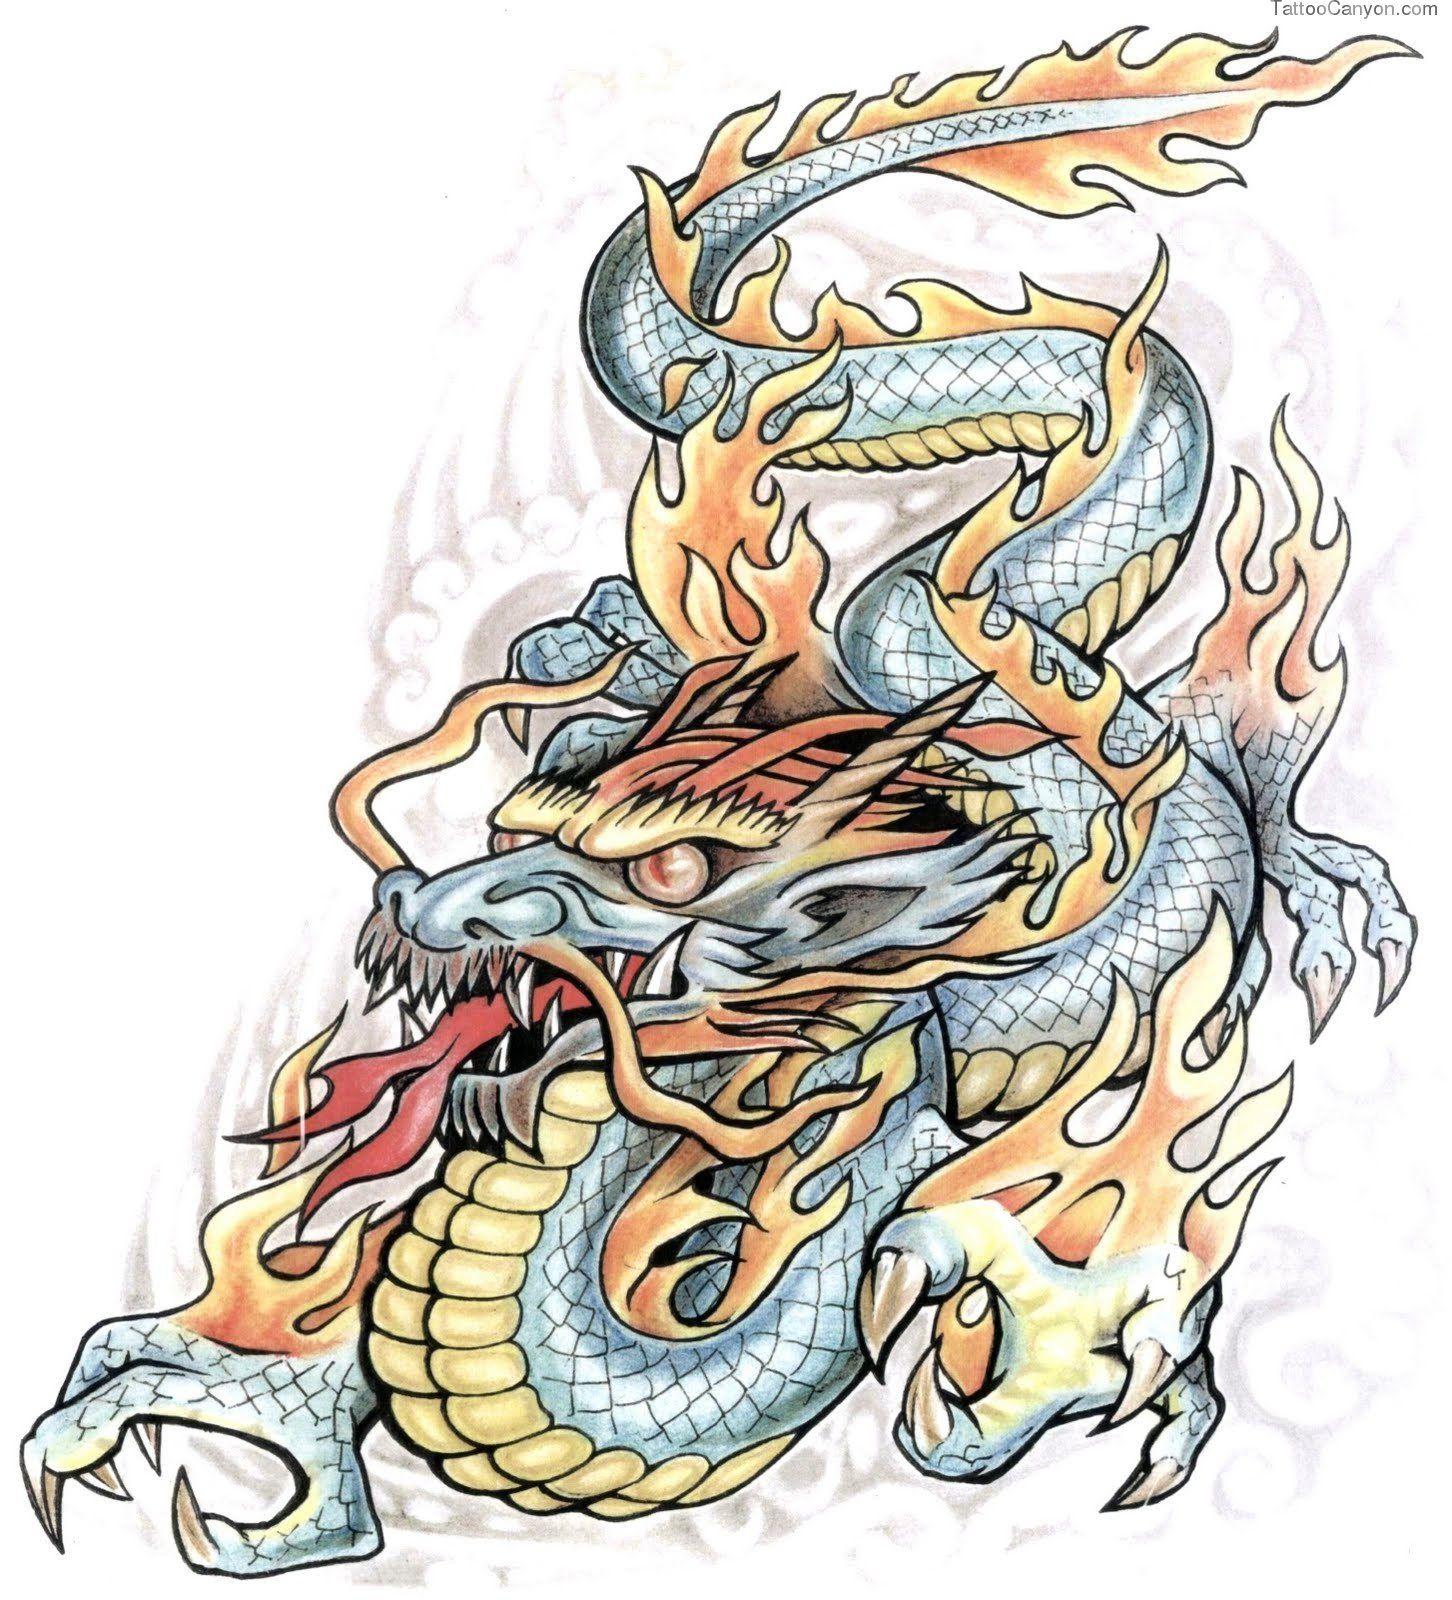 Free tattoos designs download - Chinese Dragon On Fire Tattoo Design Tattoology Free Download Picture 2939